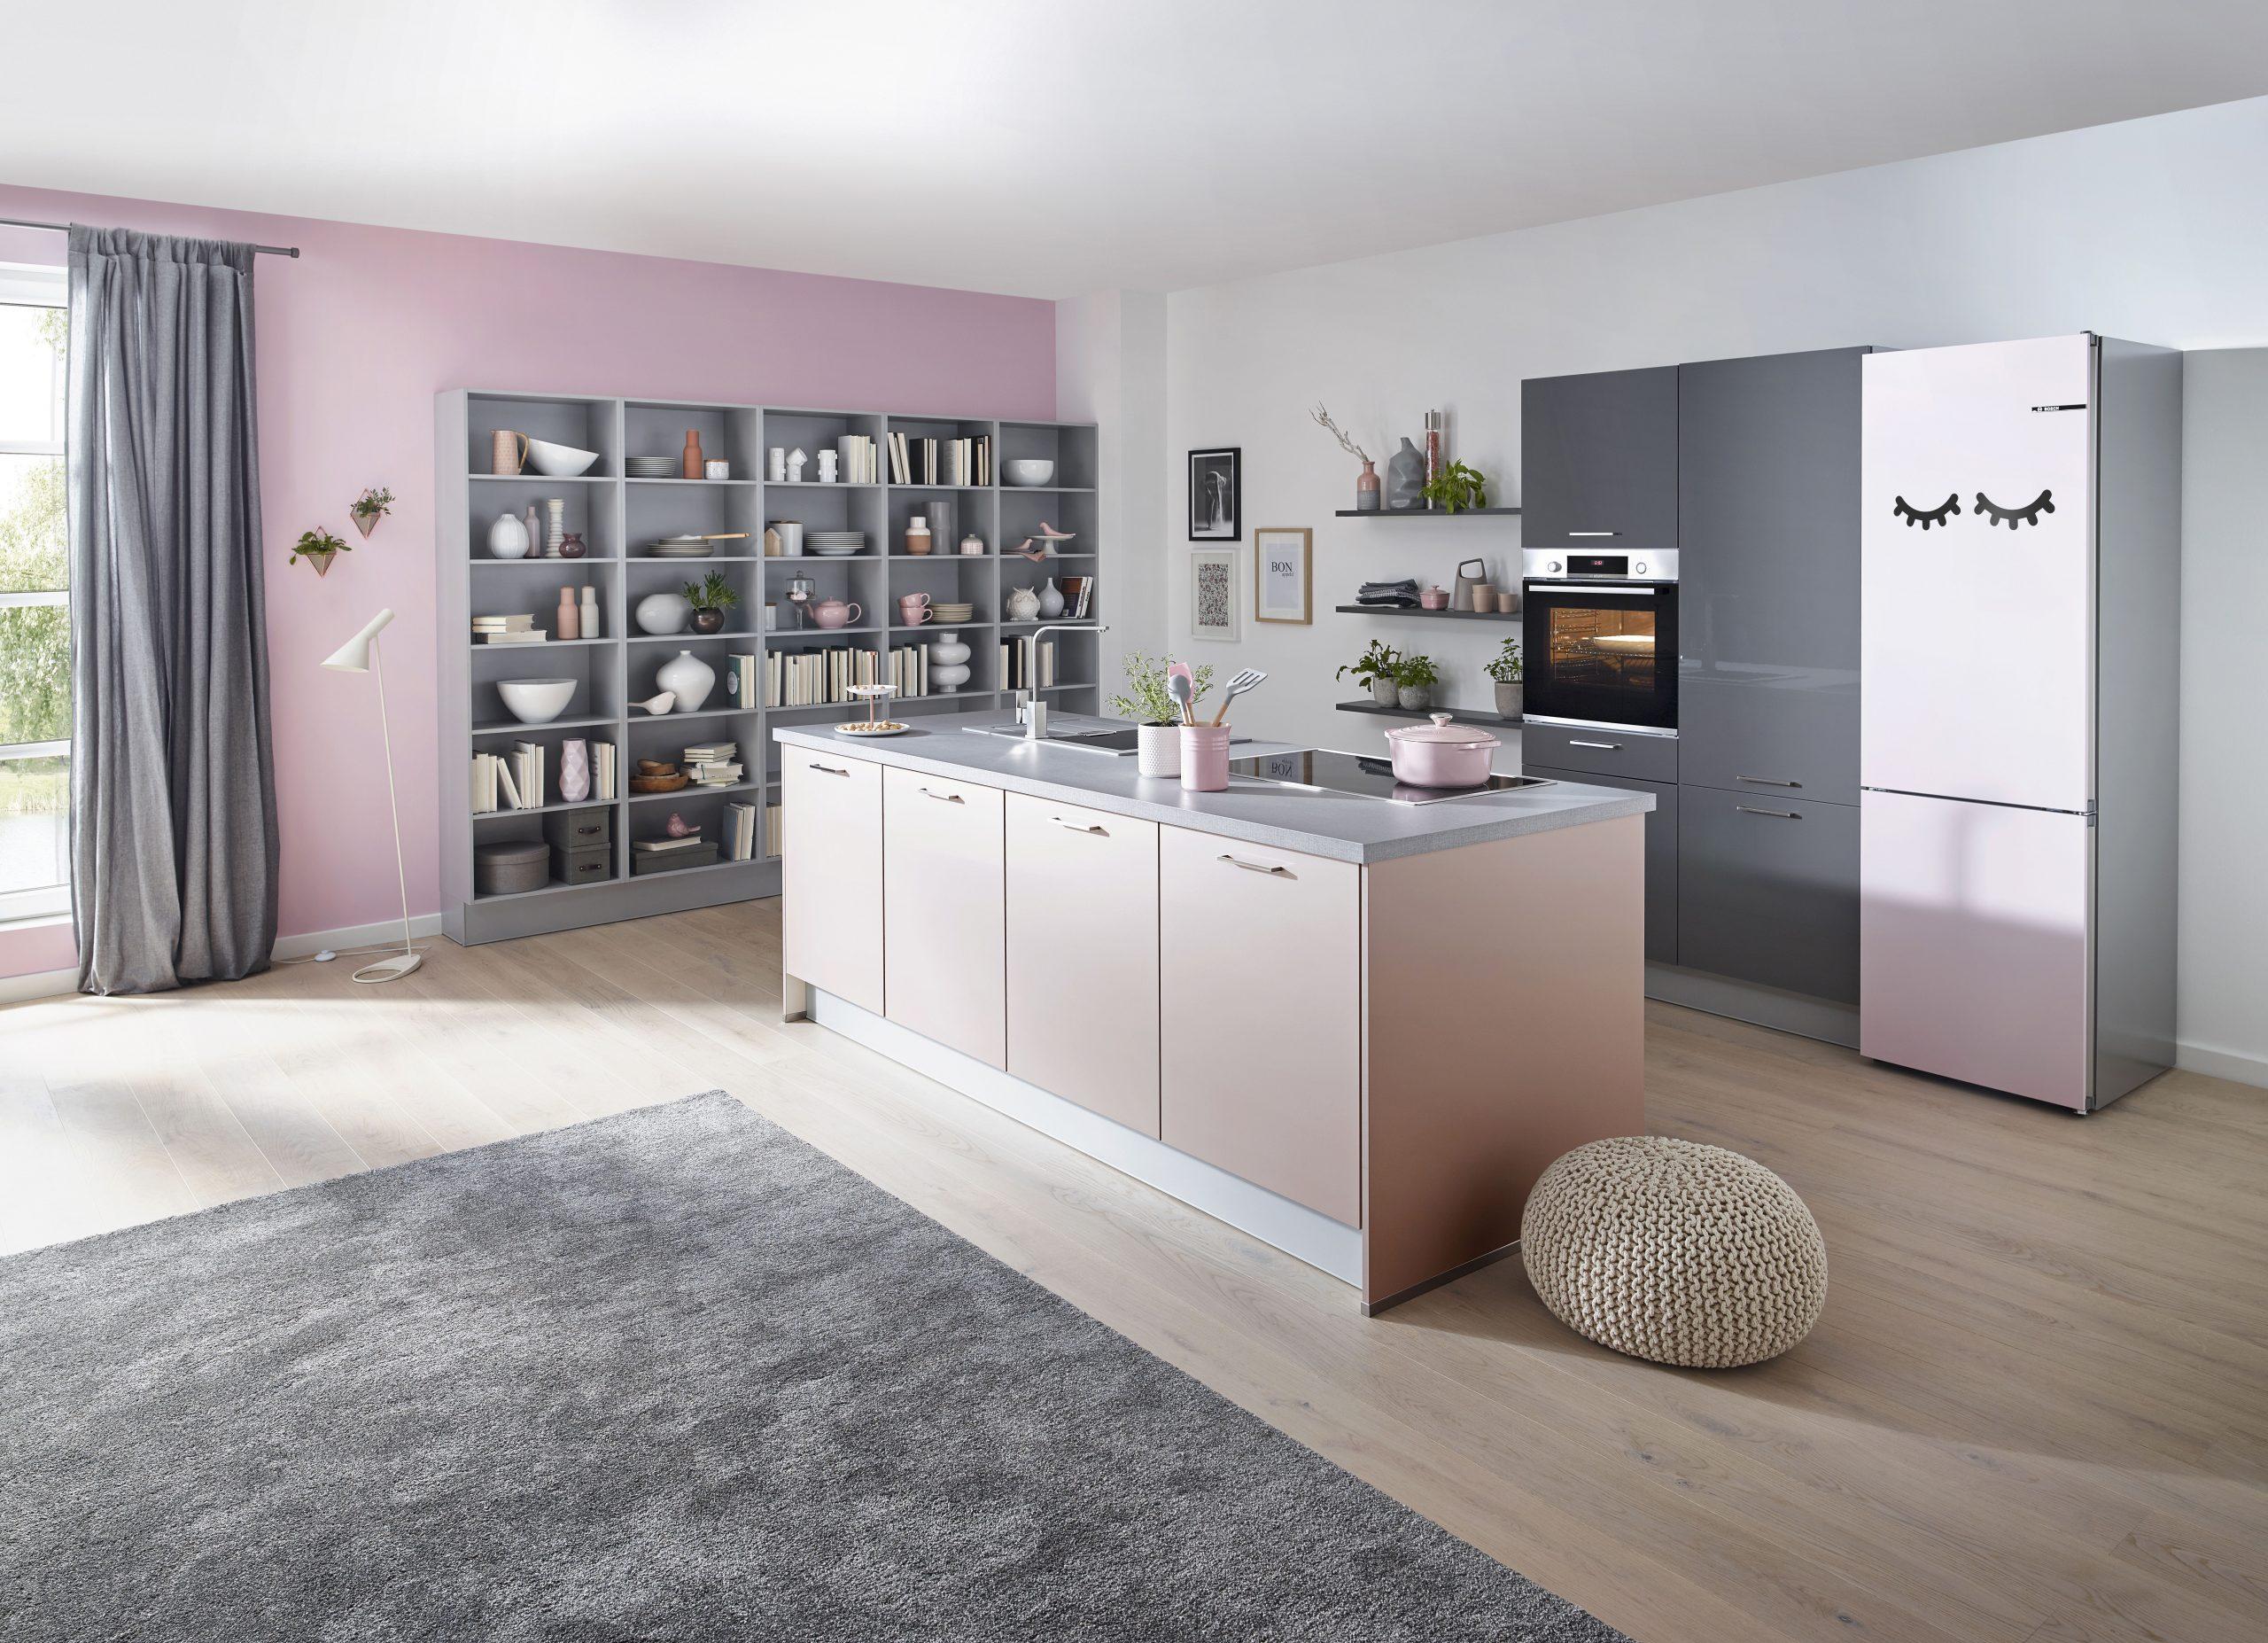 Full Size of Wandfarbe Küche Rosa Spritzschutz Küche Rosa Küche Rosa Hochglanz Ikea Küche Rosa Kinder Küche Küche Rosa